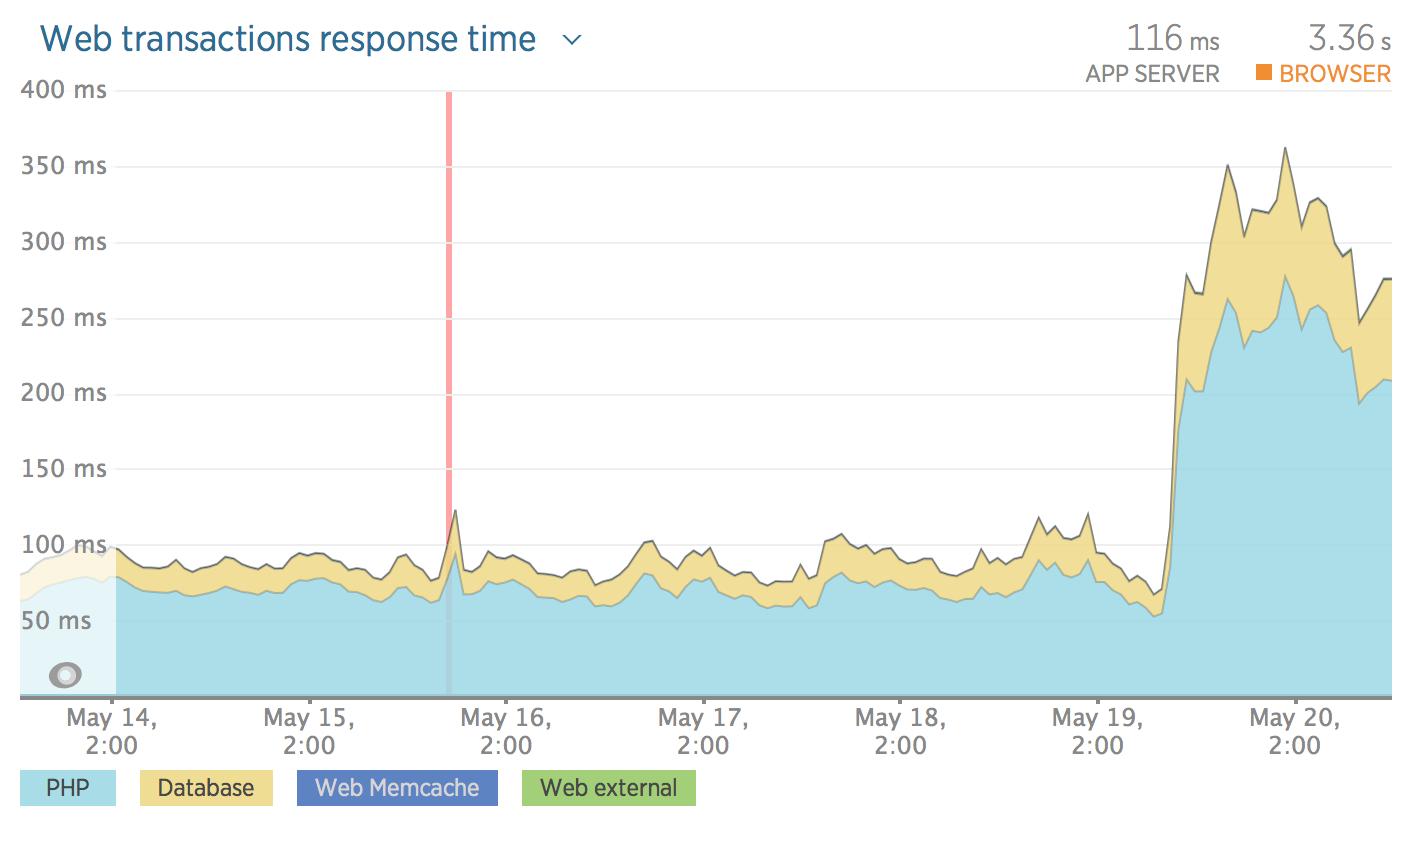 web transactions response time